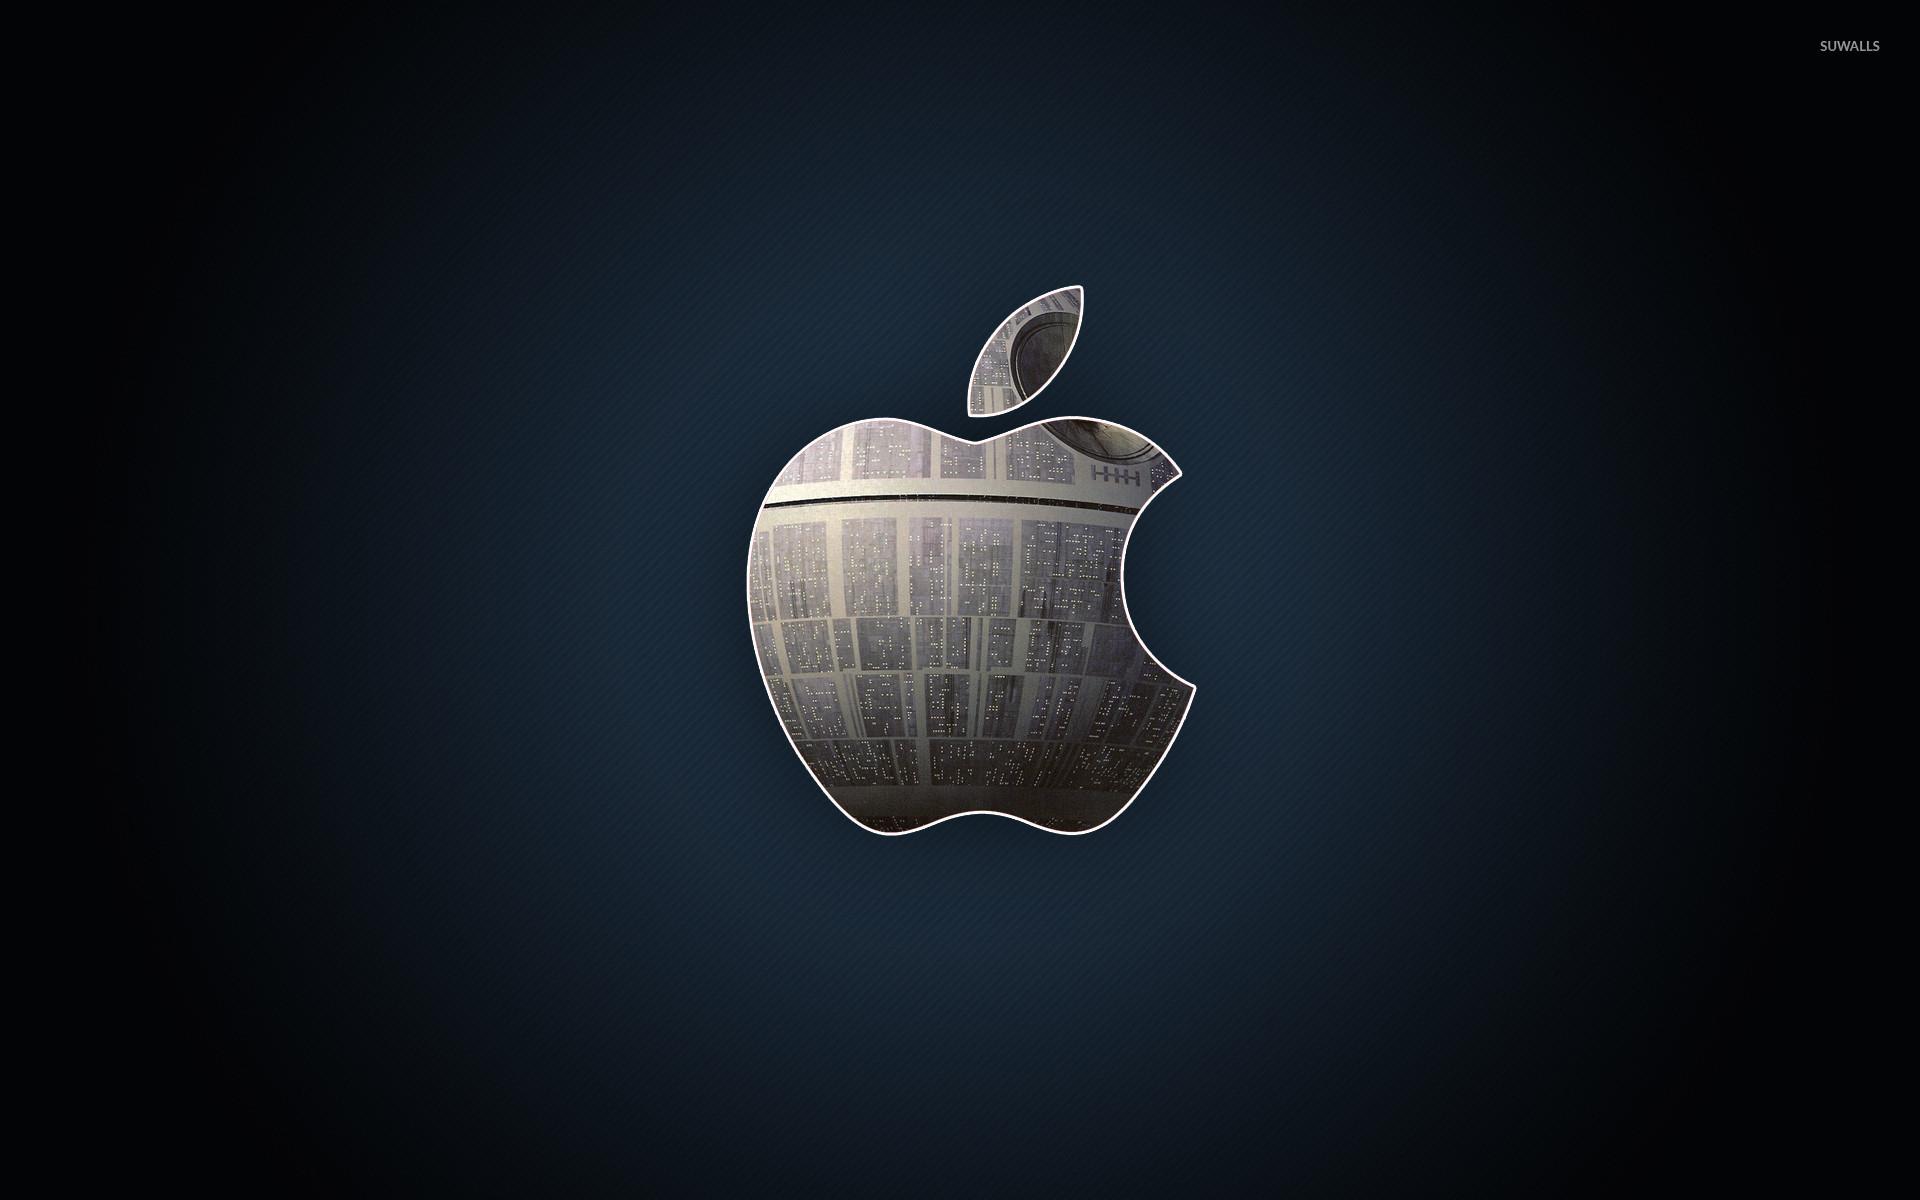 Death Star Apple Wallpaper